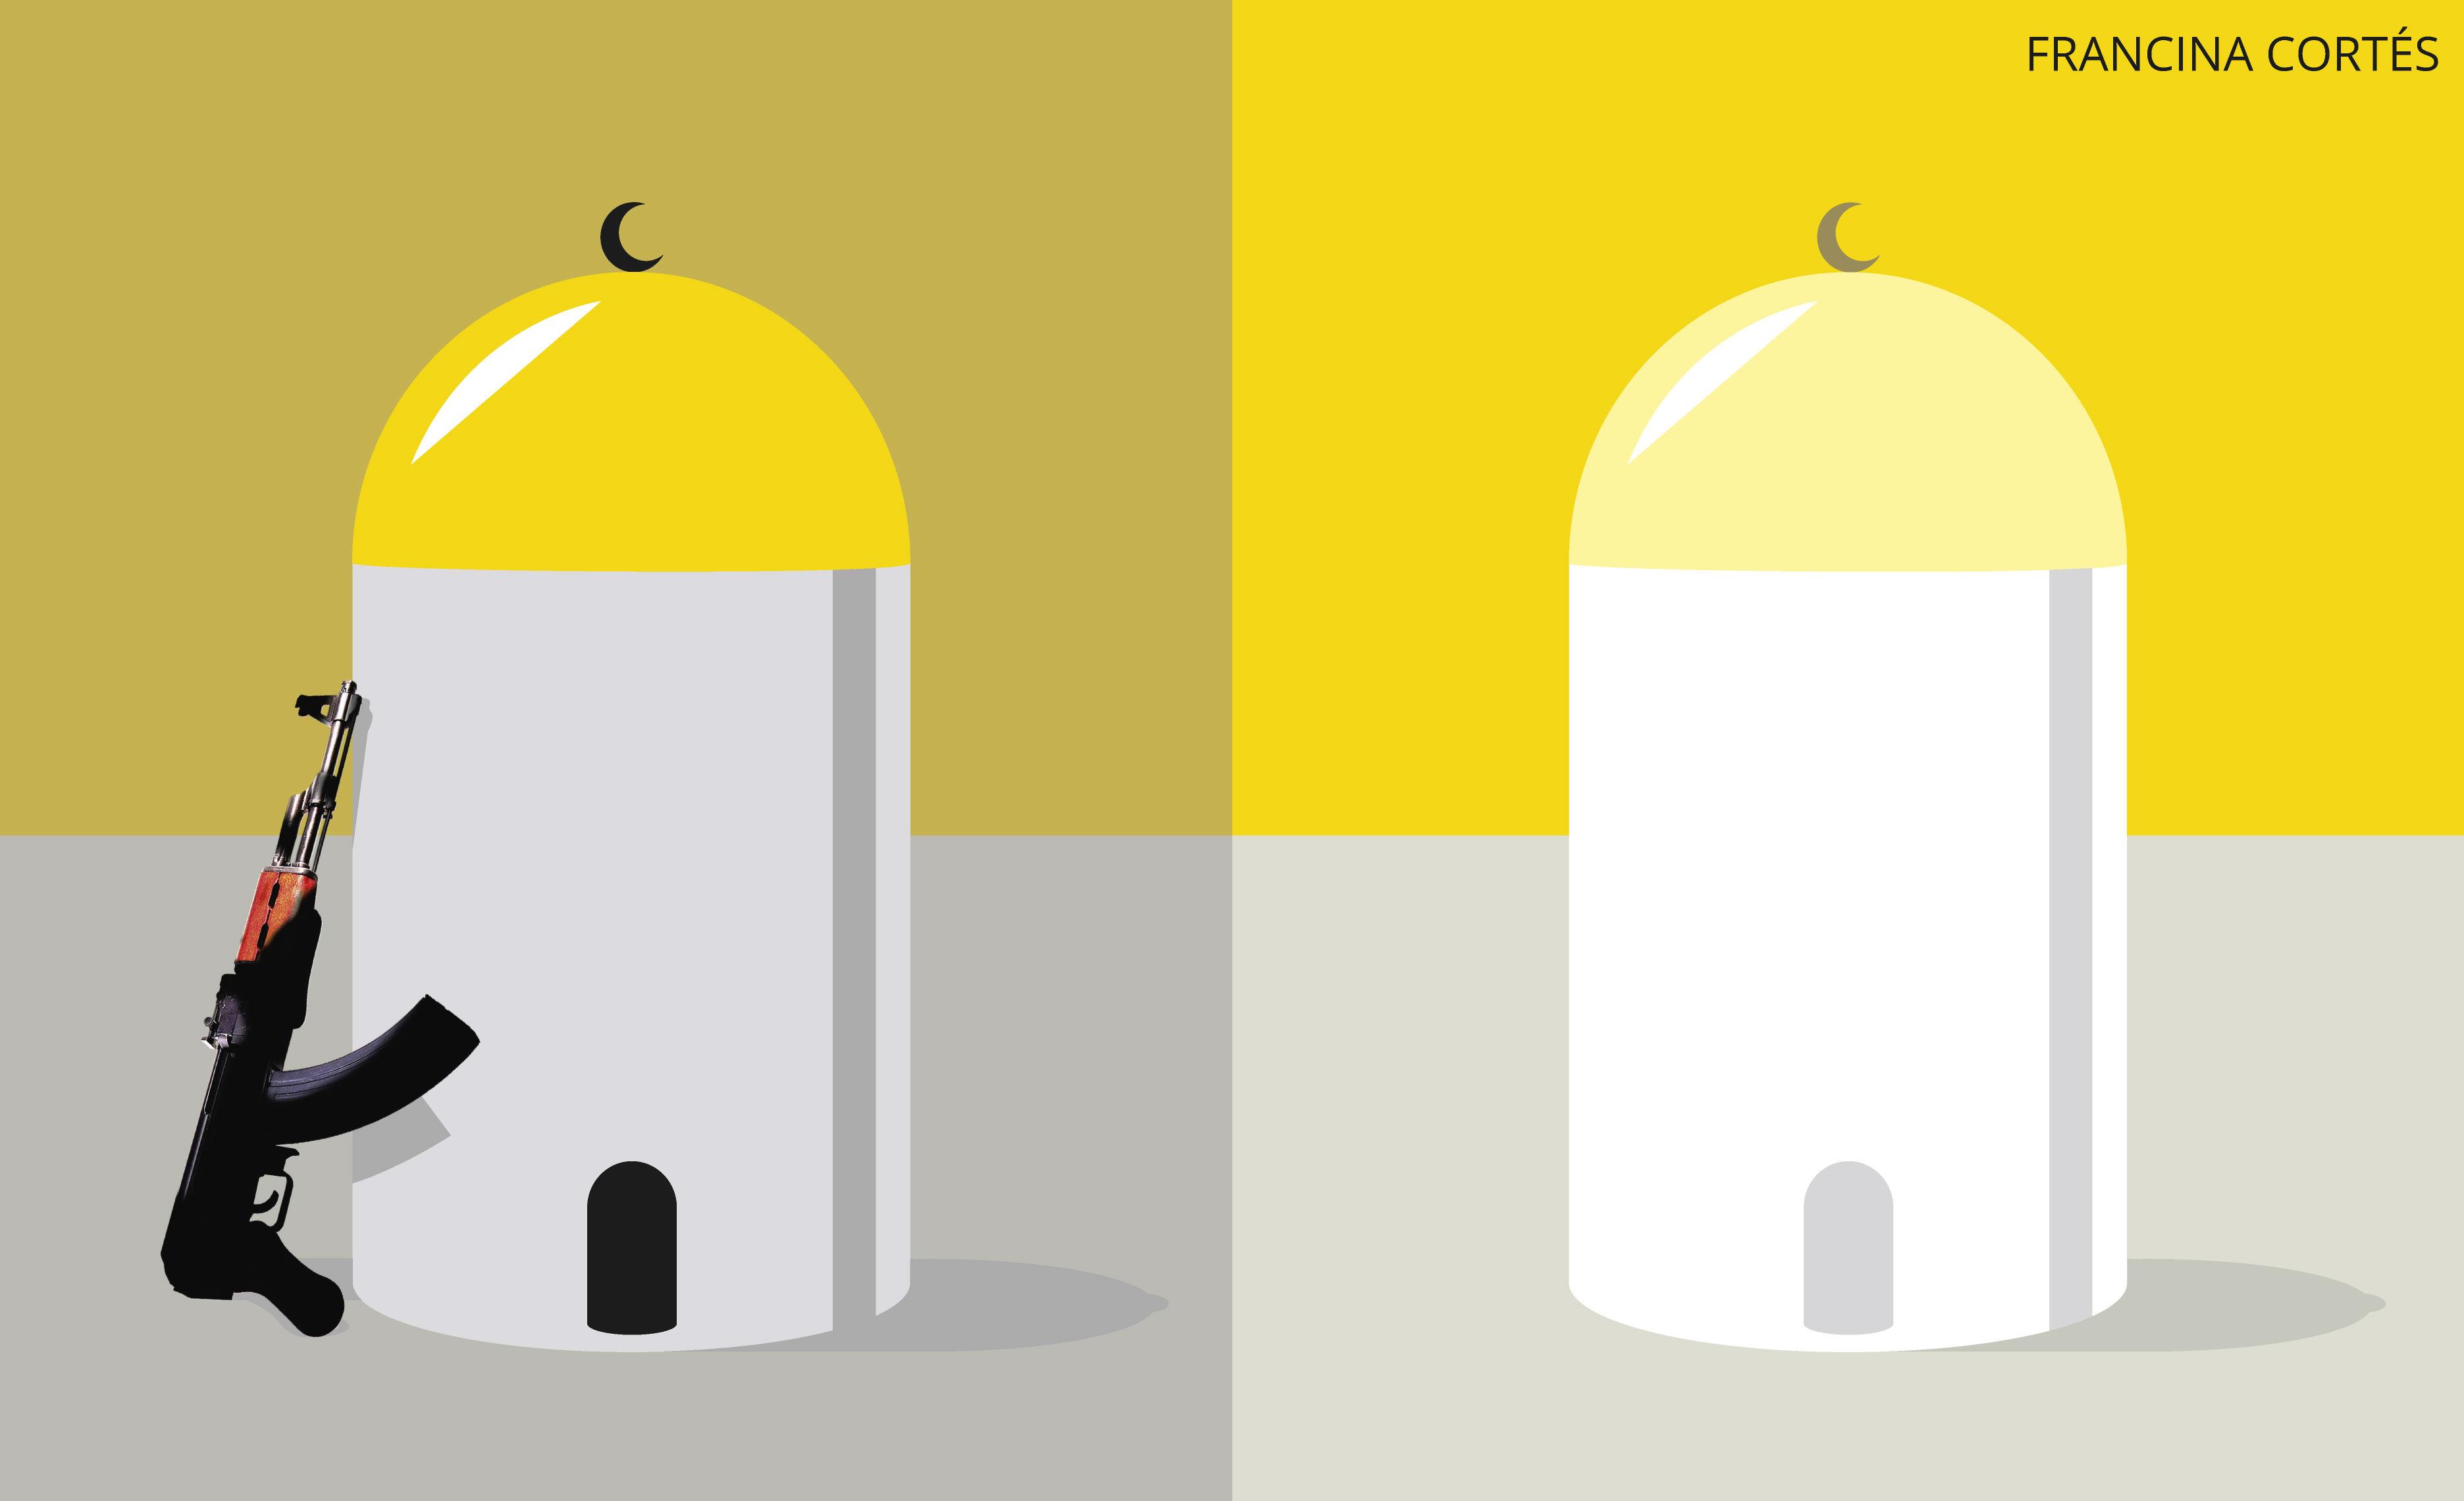 La trampa de la 'islamofobia'